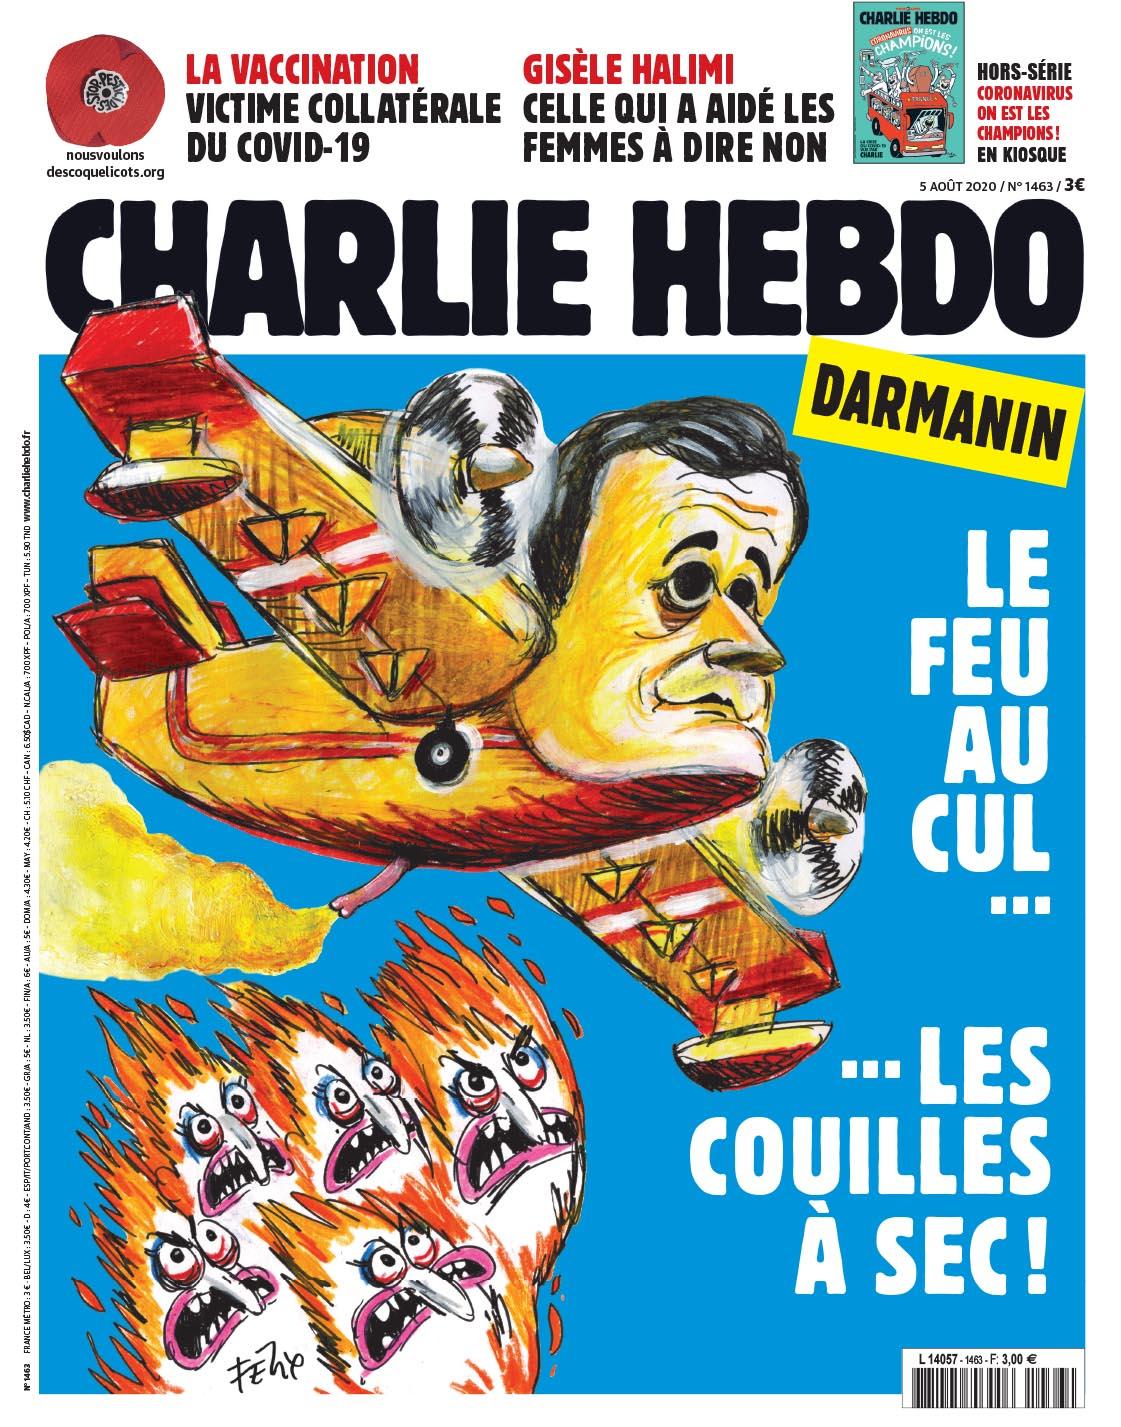 Charlie Hebdo n°1463 -- 5 août  2020 --- FÉLIX --- Darmanin, le feu au cul... ... les couilles à sec